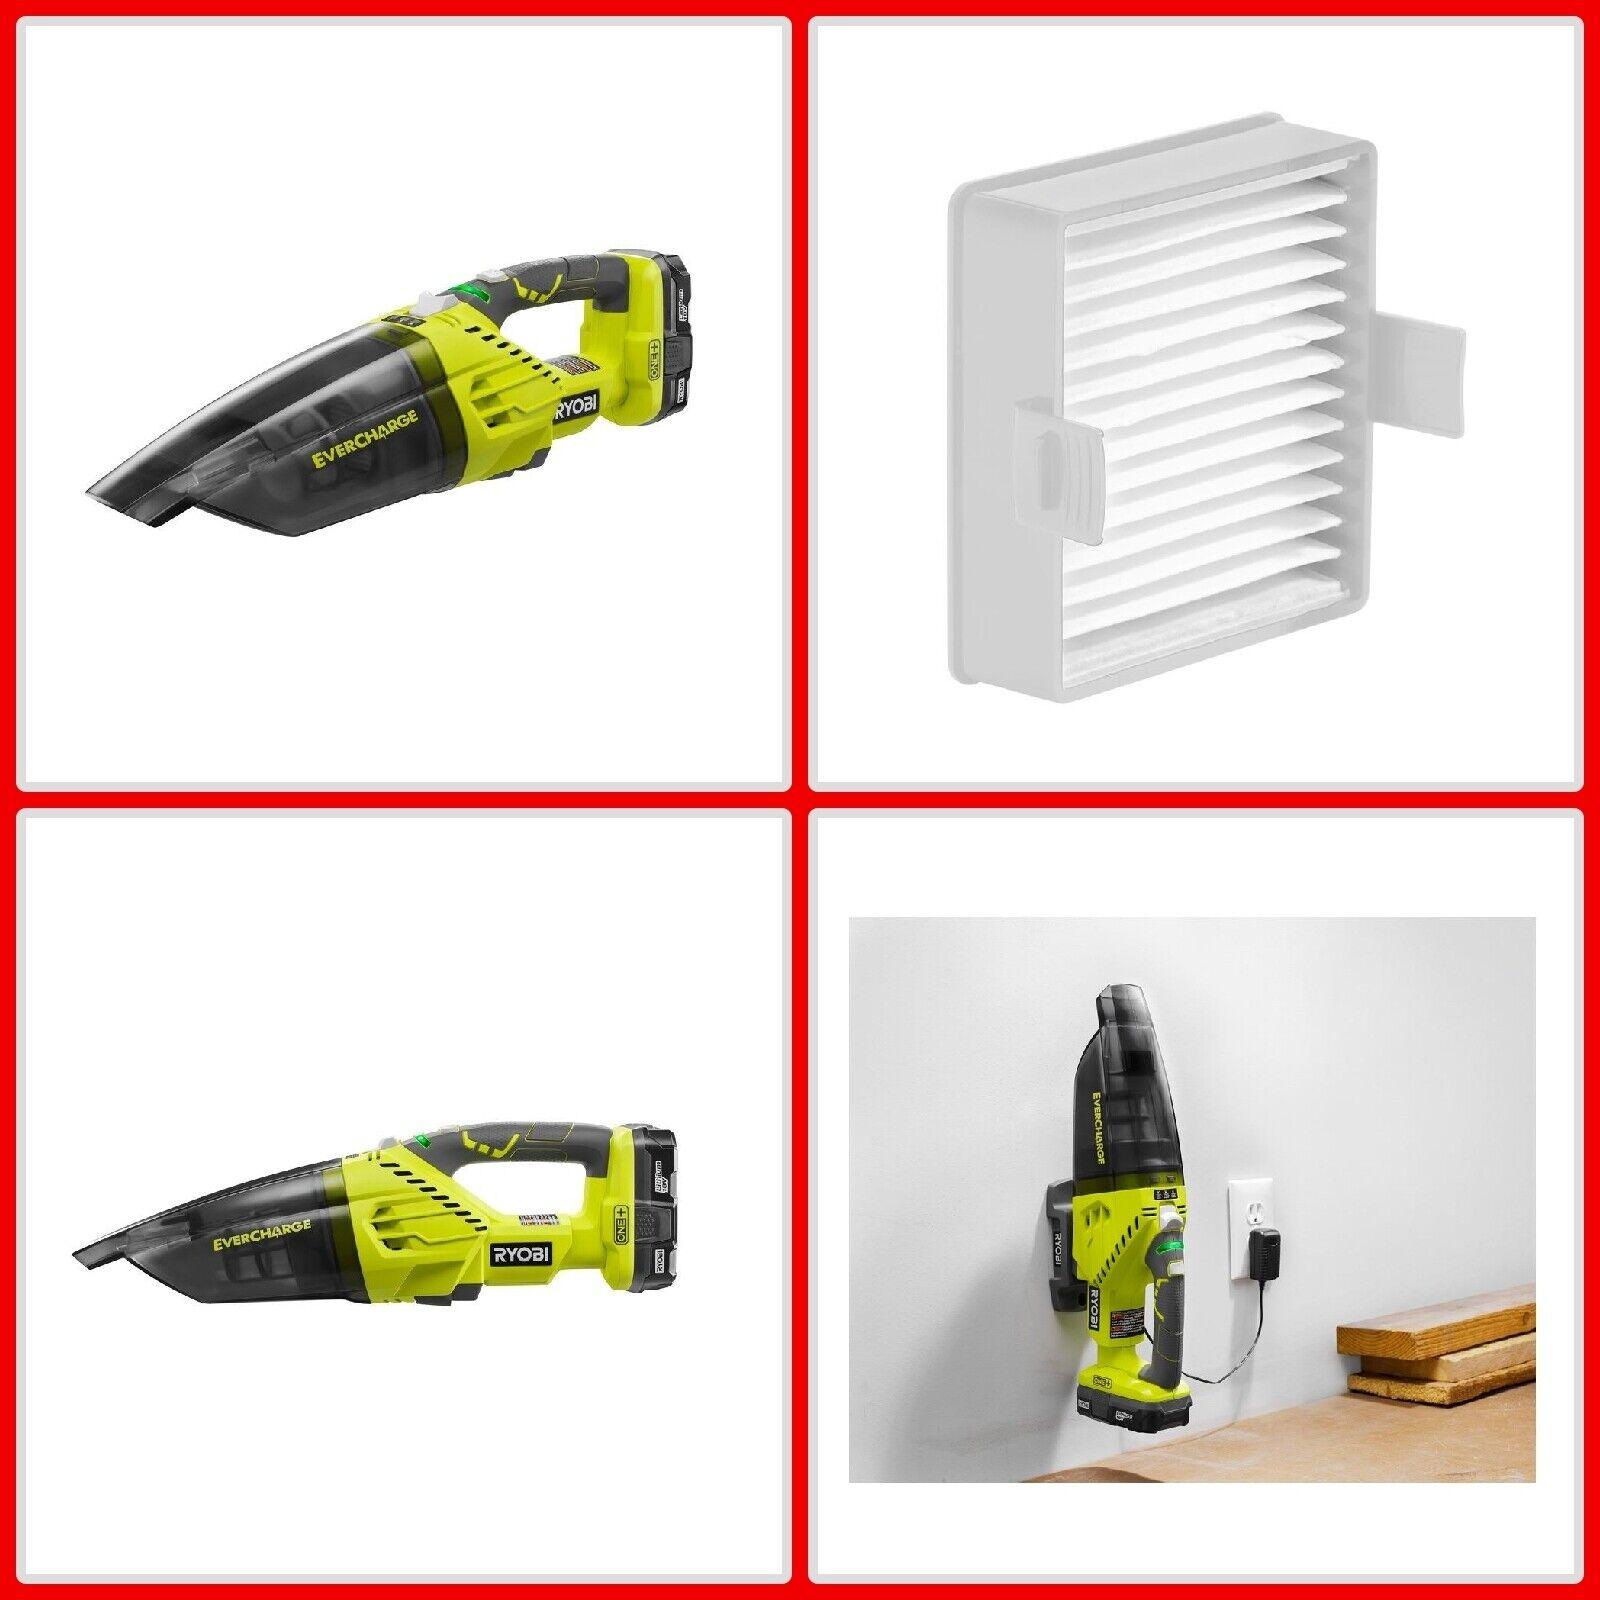 Ryobi Hand Vacuum Cleaner Kit 18-Volt Portable Handheld Vac